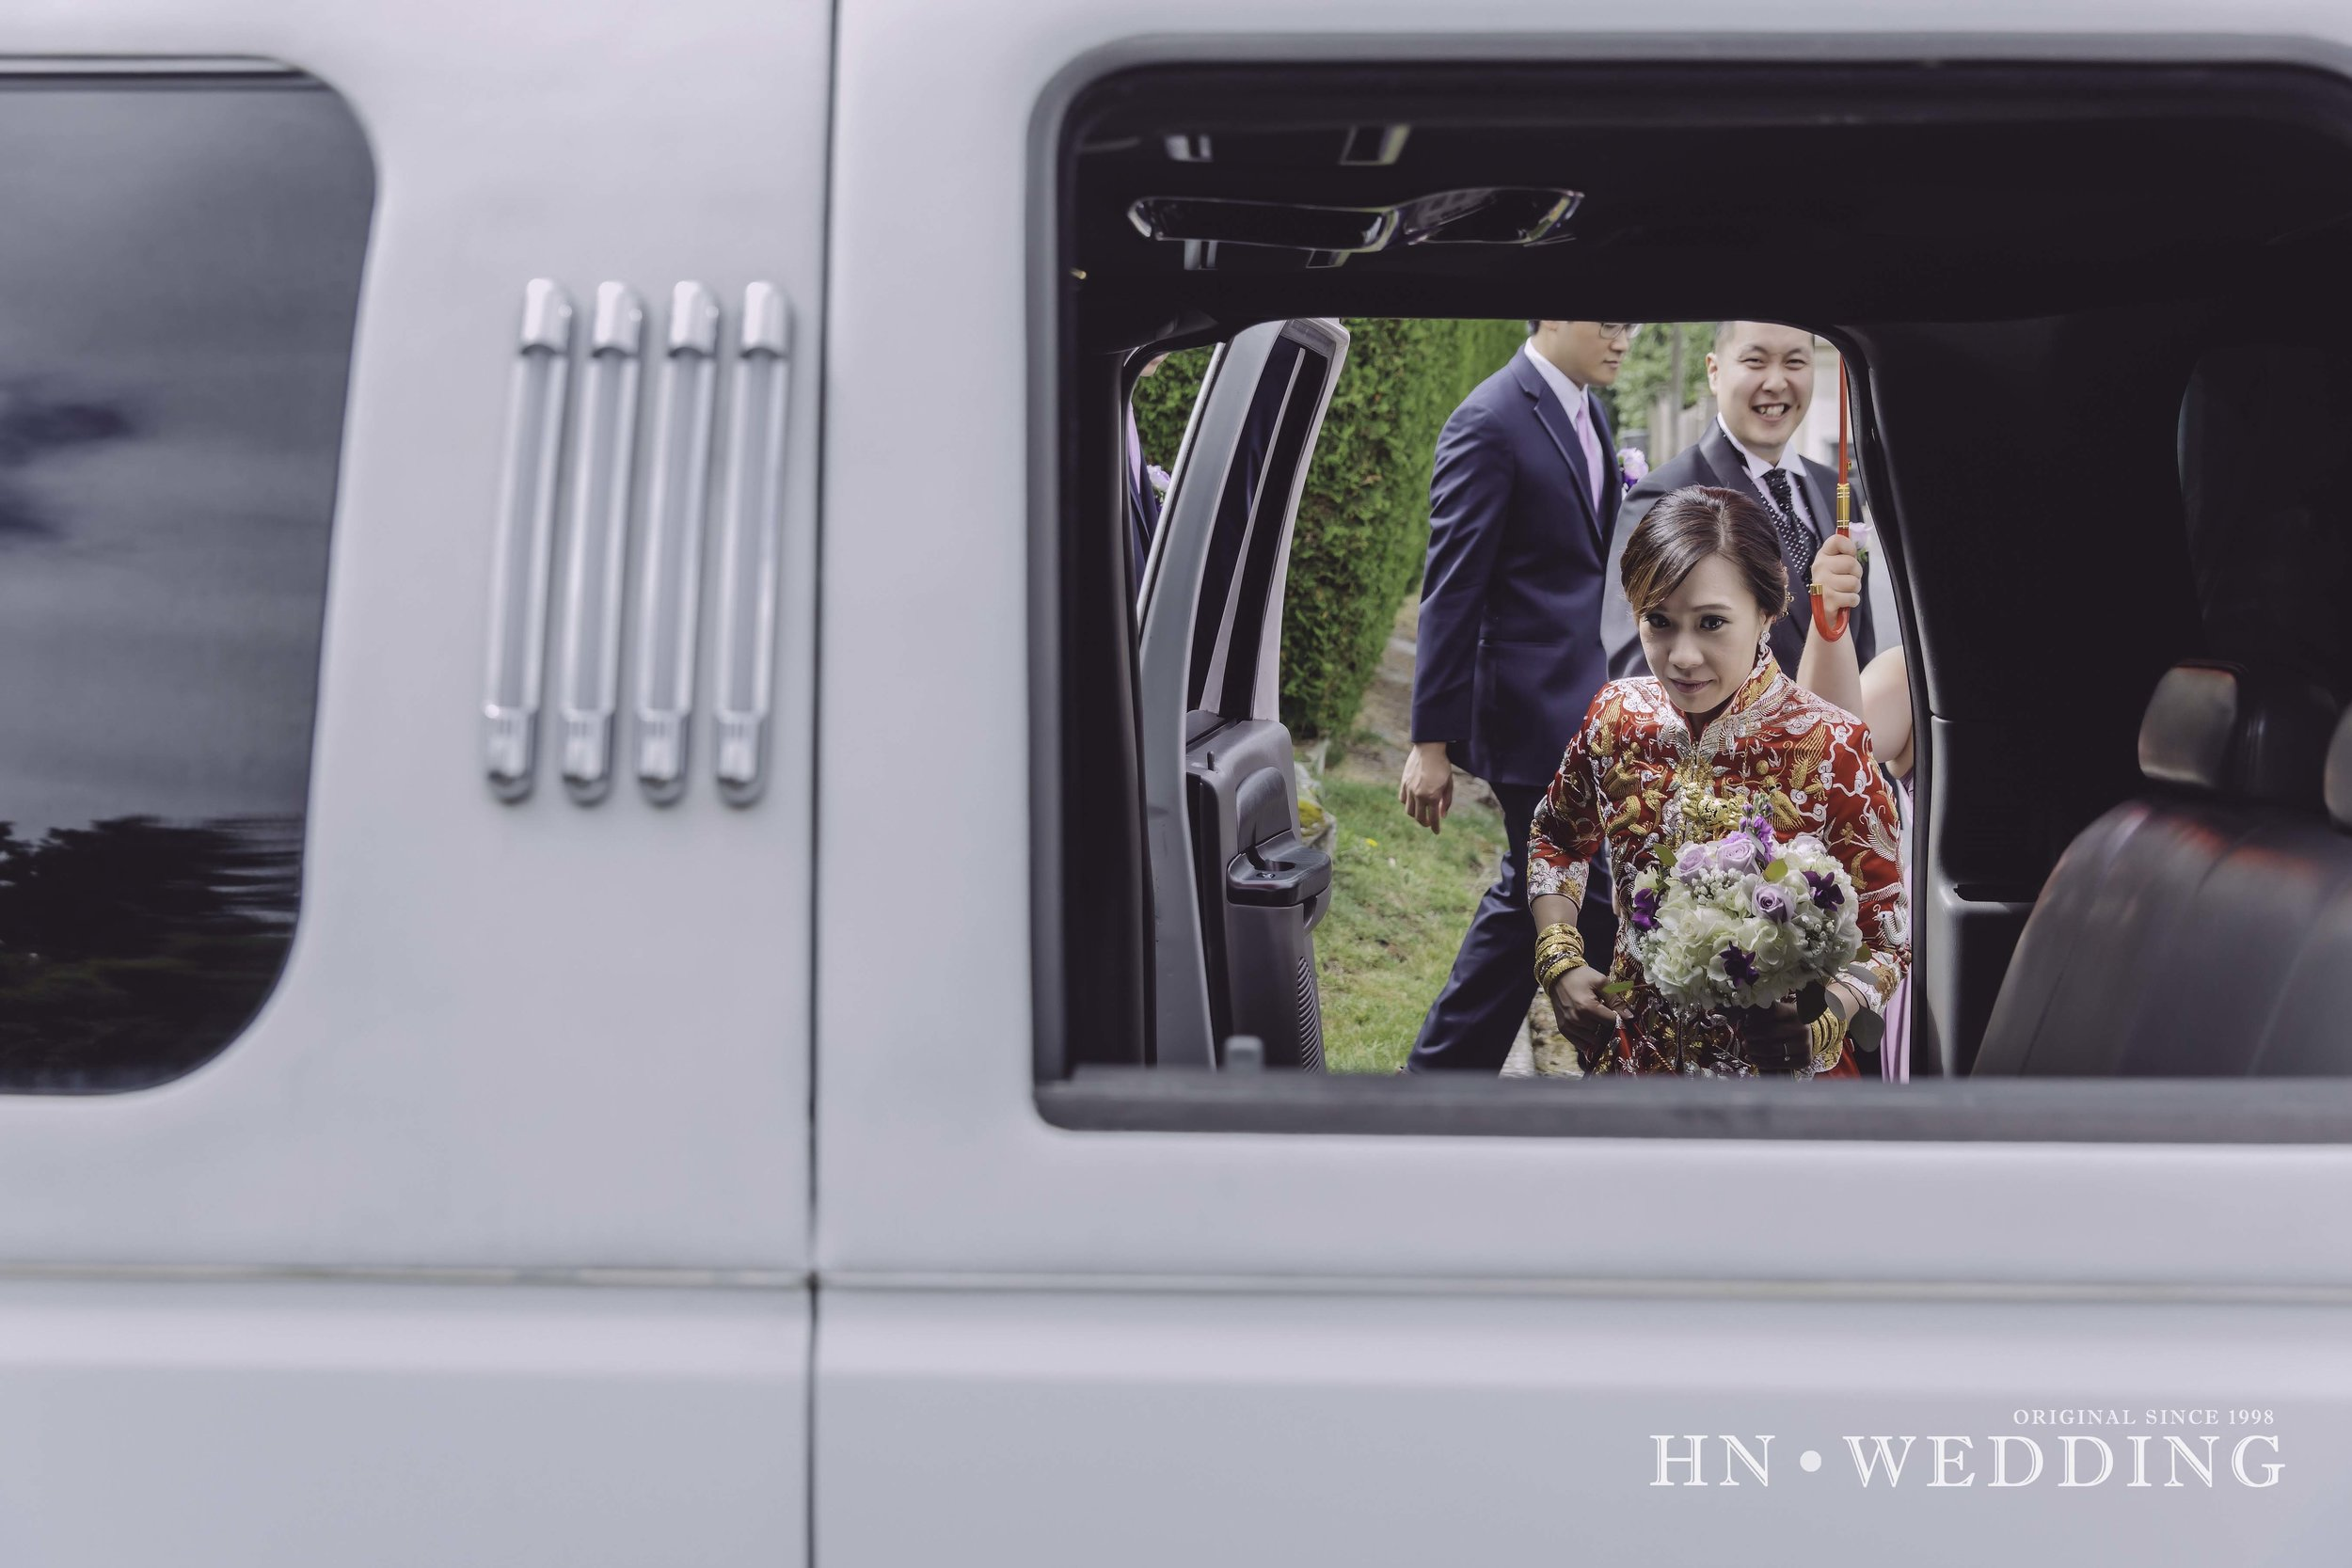 HNwedding-20160822-wedding-6020.jpg